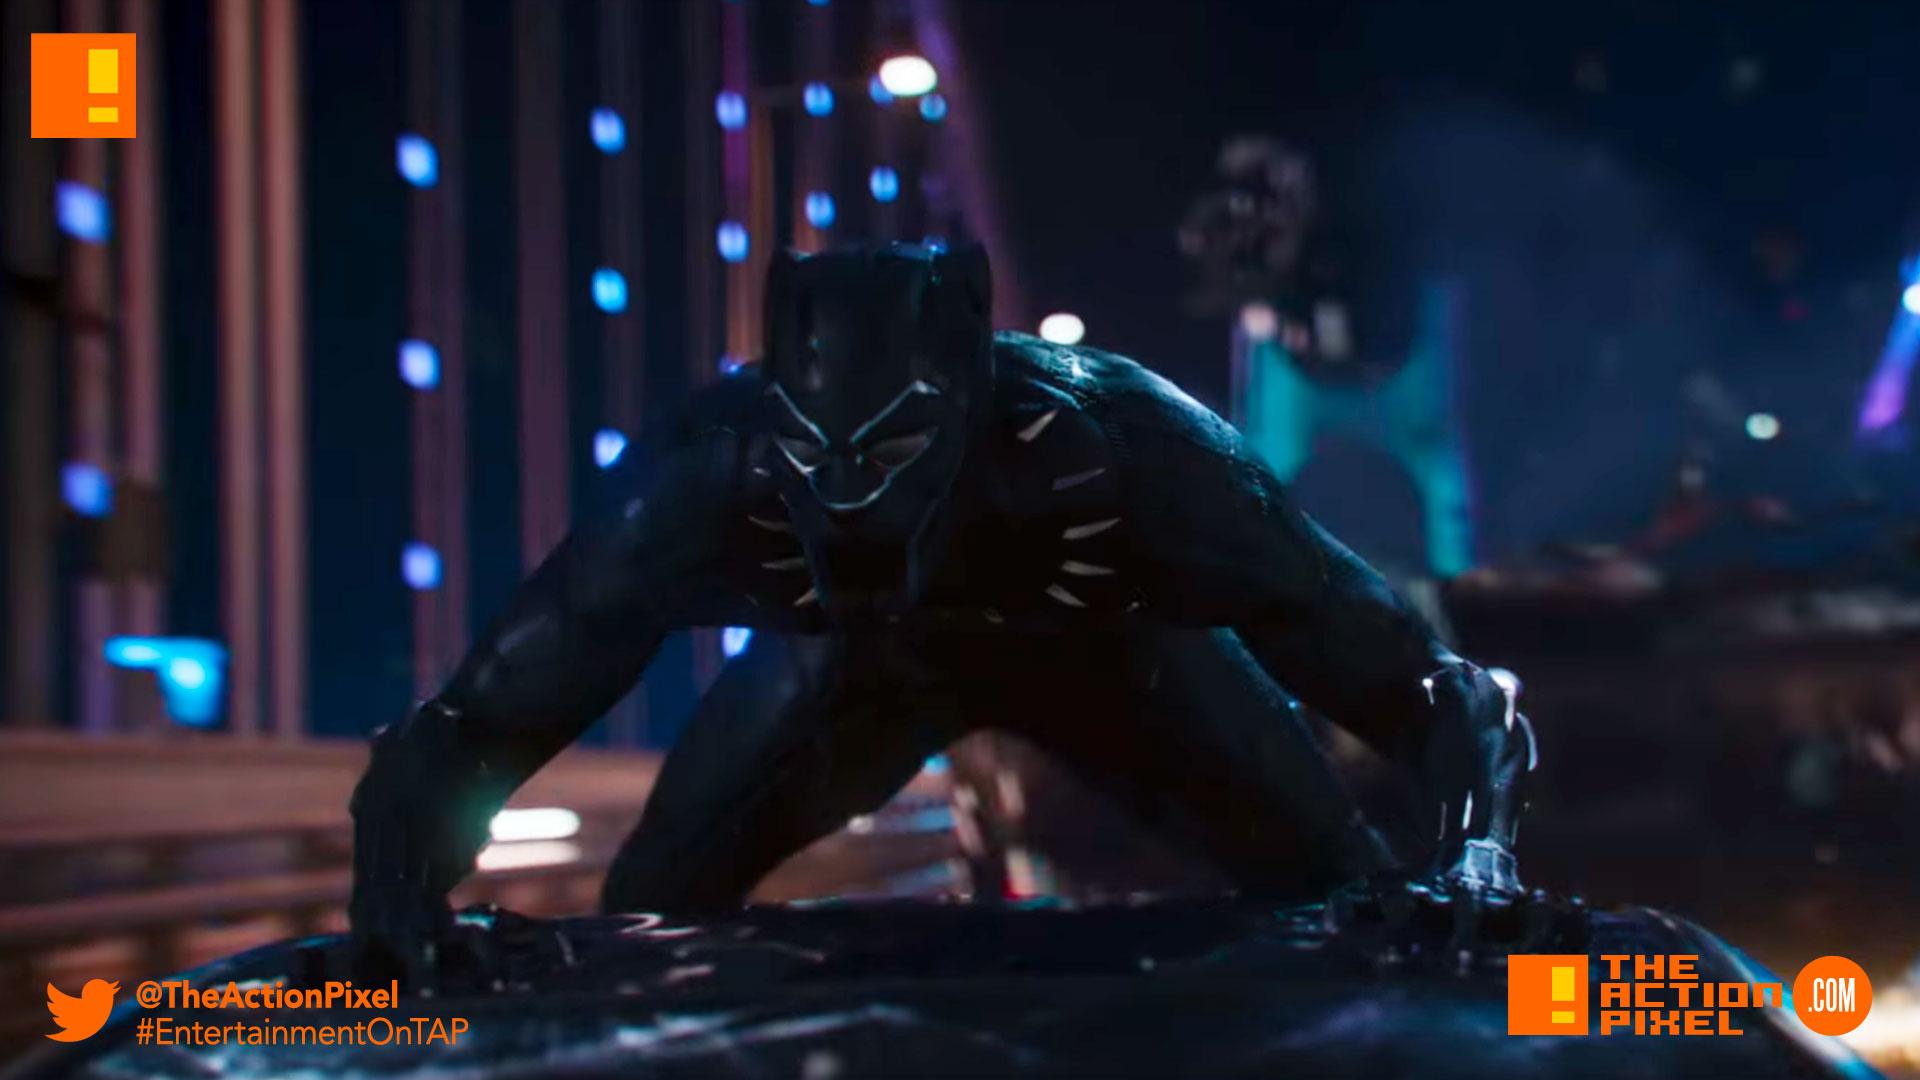 black panther,poster, black panther,marvel studios, marvel, comics, chadwick boseman, gritty, black panther, movie, entertainment on tap, civil war, captain america